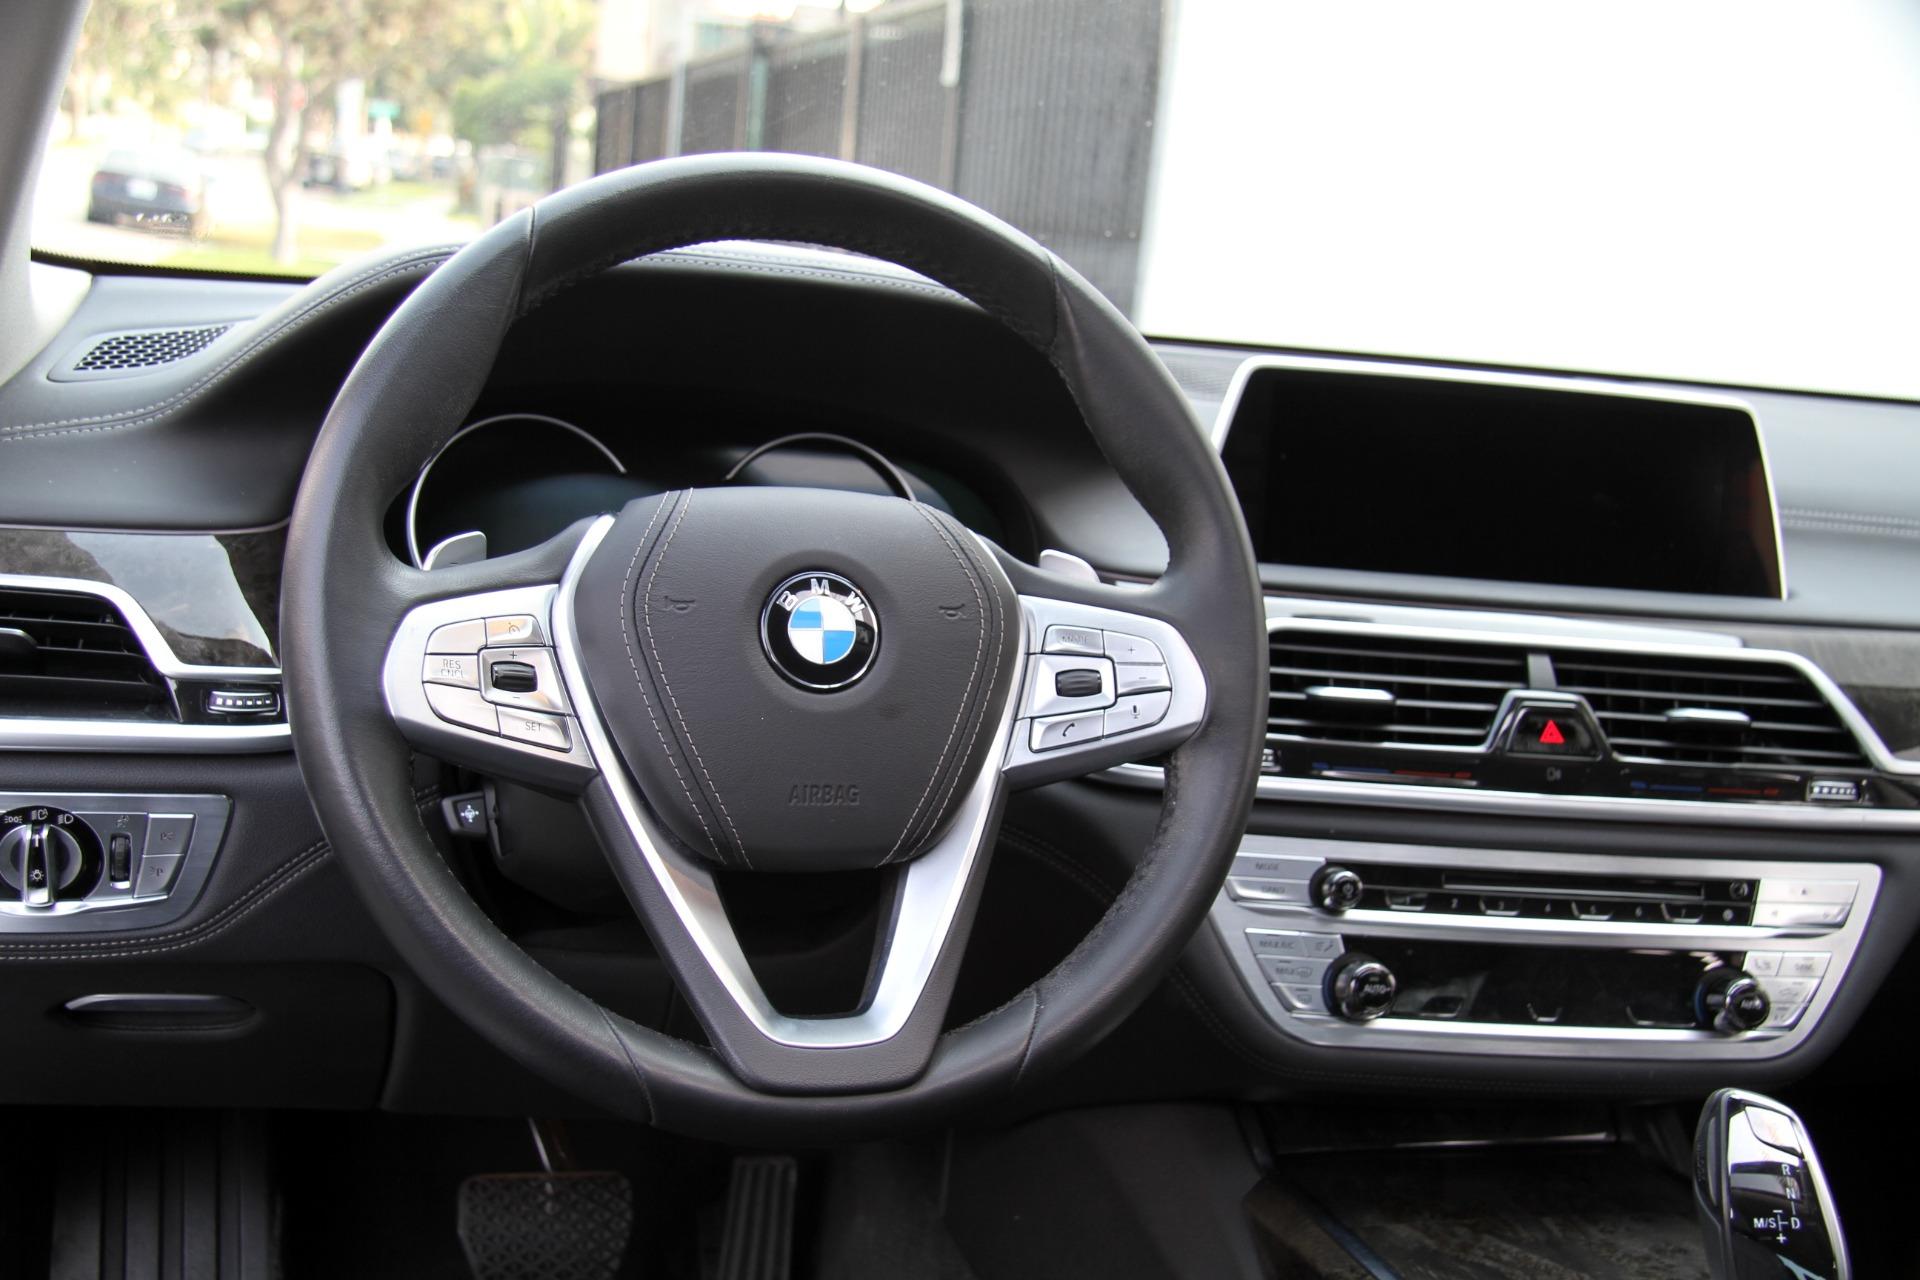 Bmw Dealership Near Me >> 2016 BMW 7 Series 740i Stock # 6074 for sale near Redondo Beach, CA | CA BMW Dealer